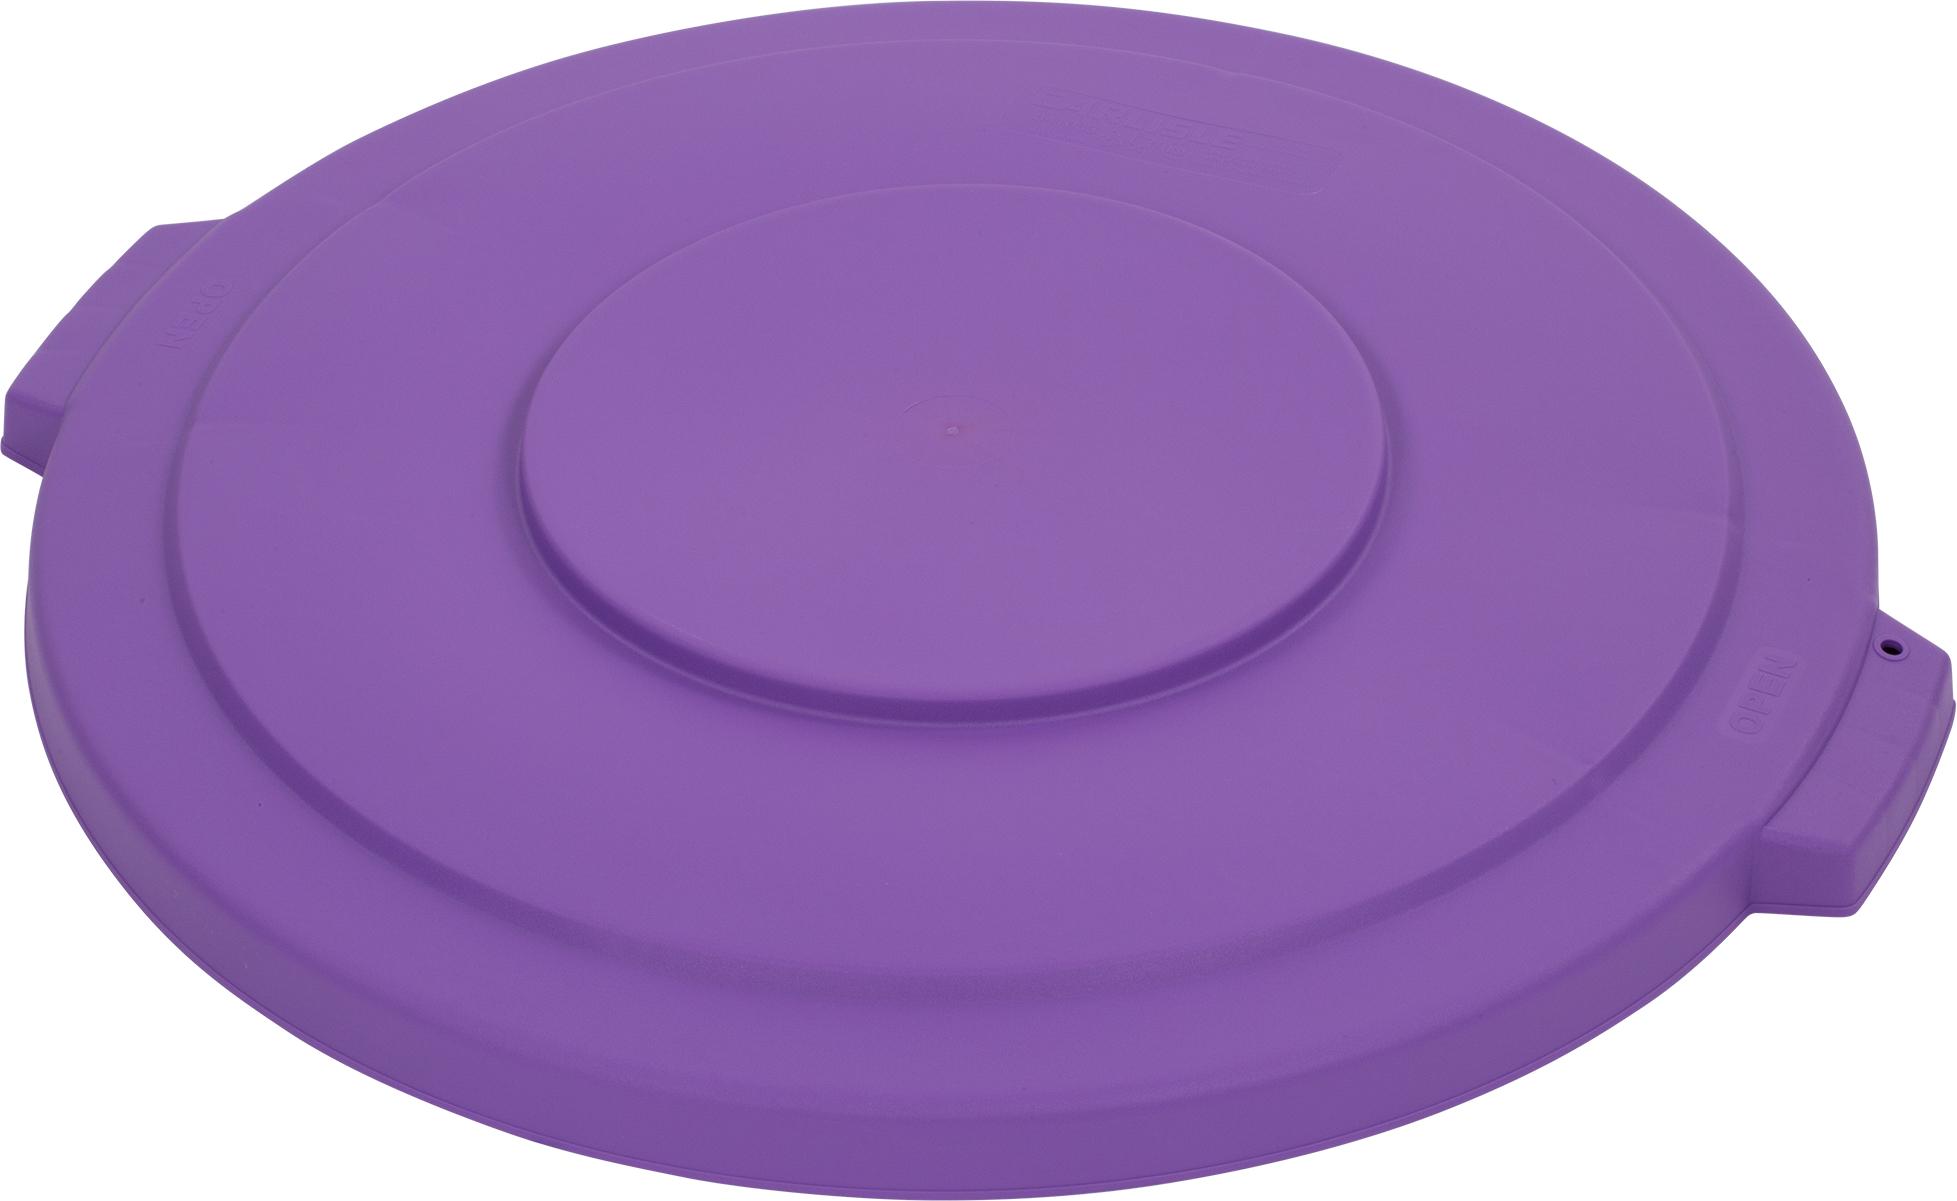 Bronco Round Waste Bin Trash Container Lid 32 Gallon - Purple